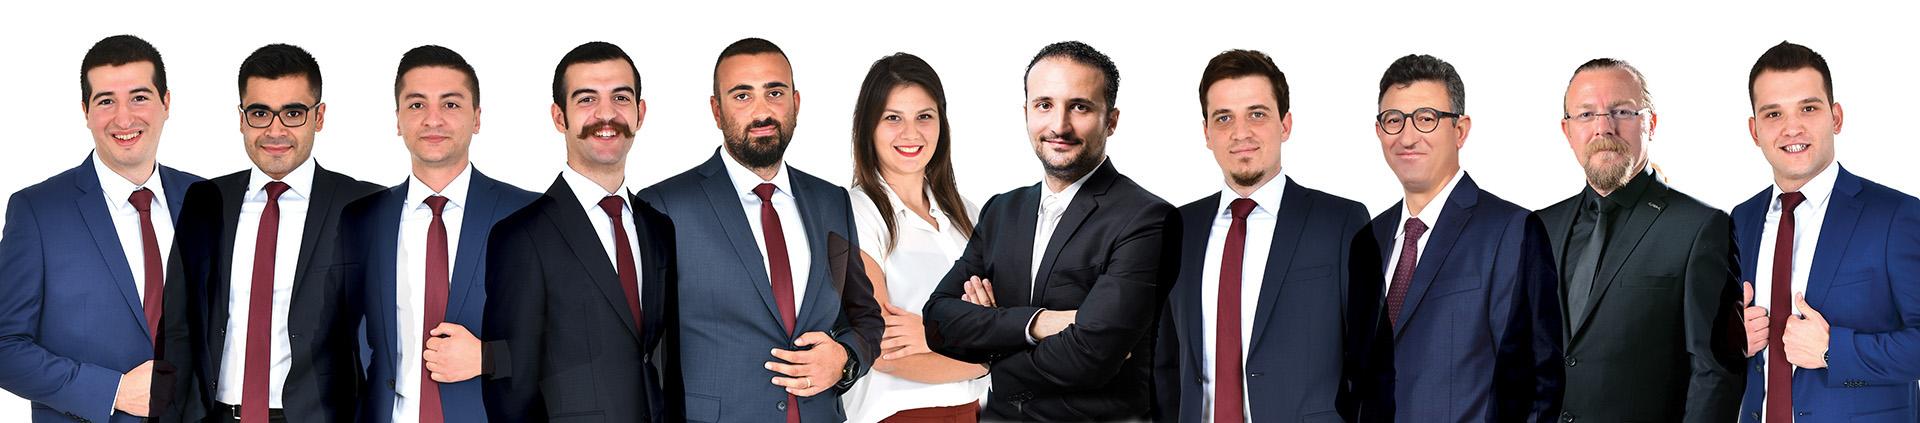 team_foto_beyaz_kucuk